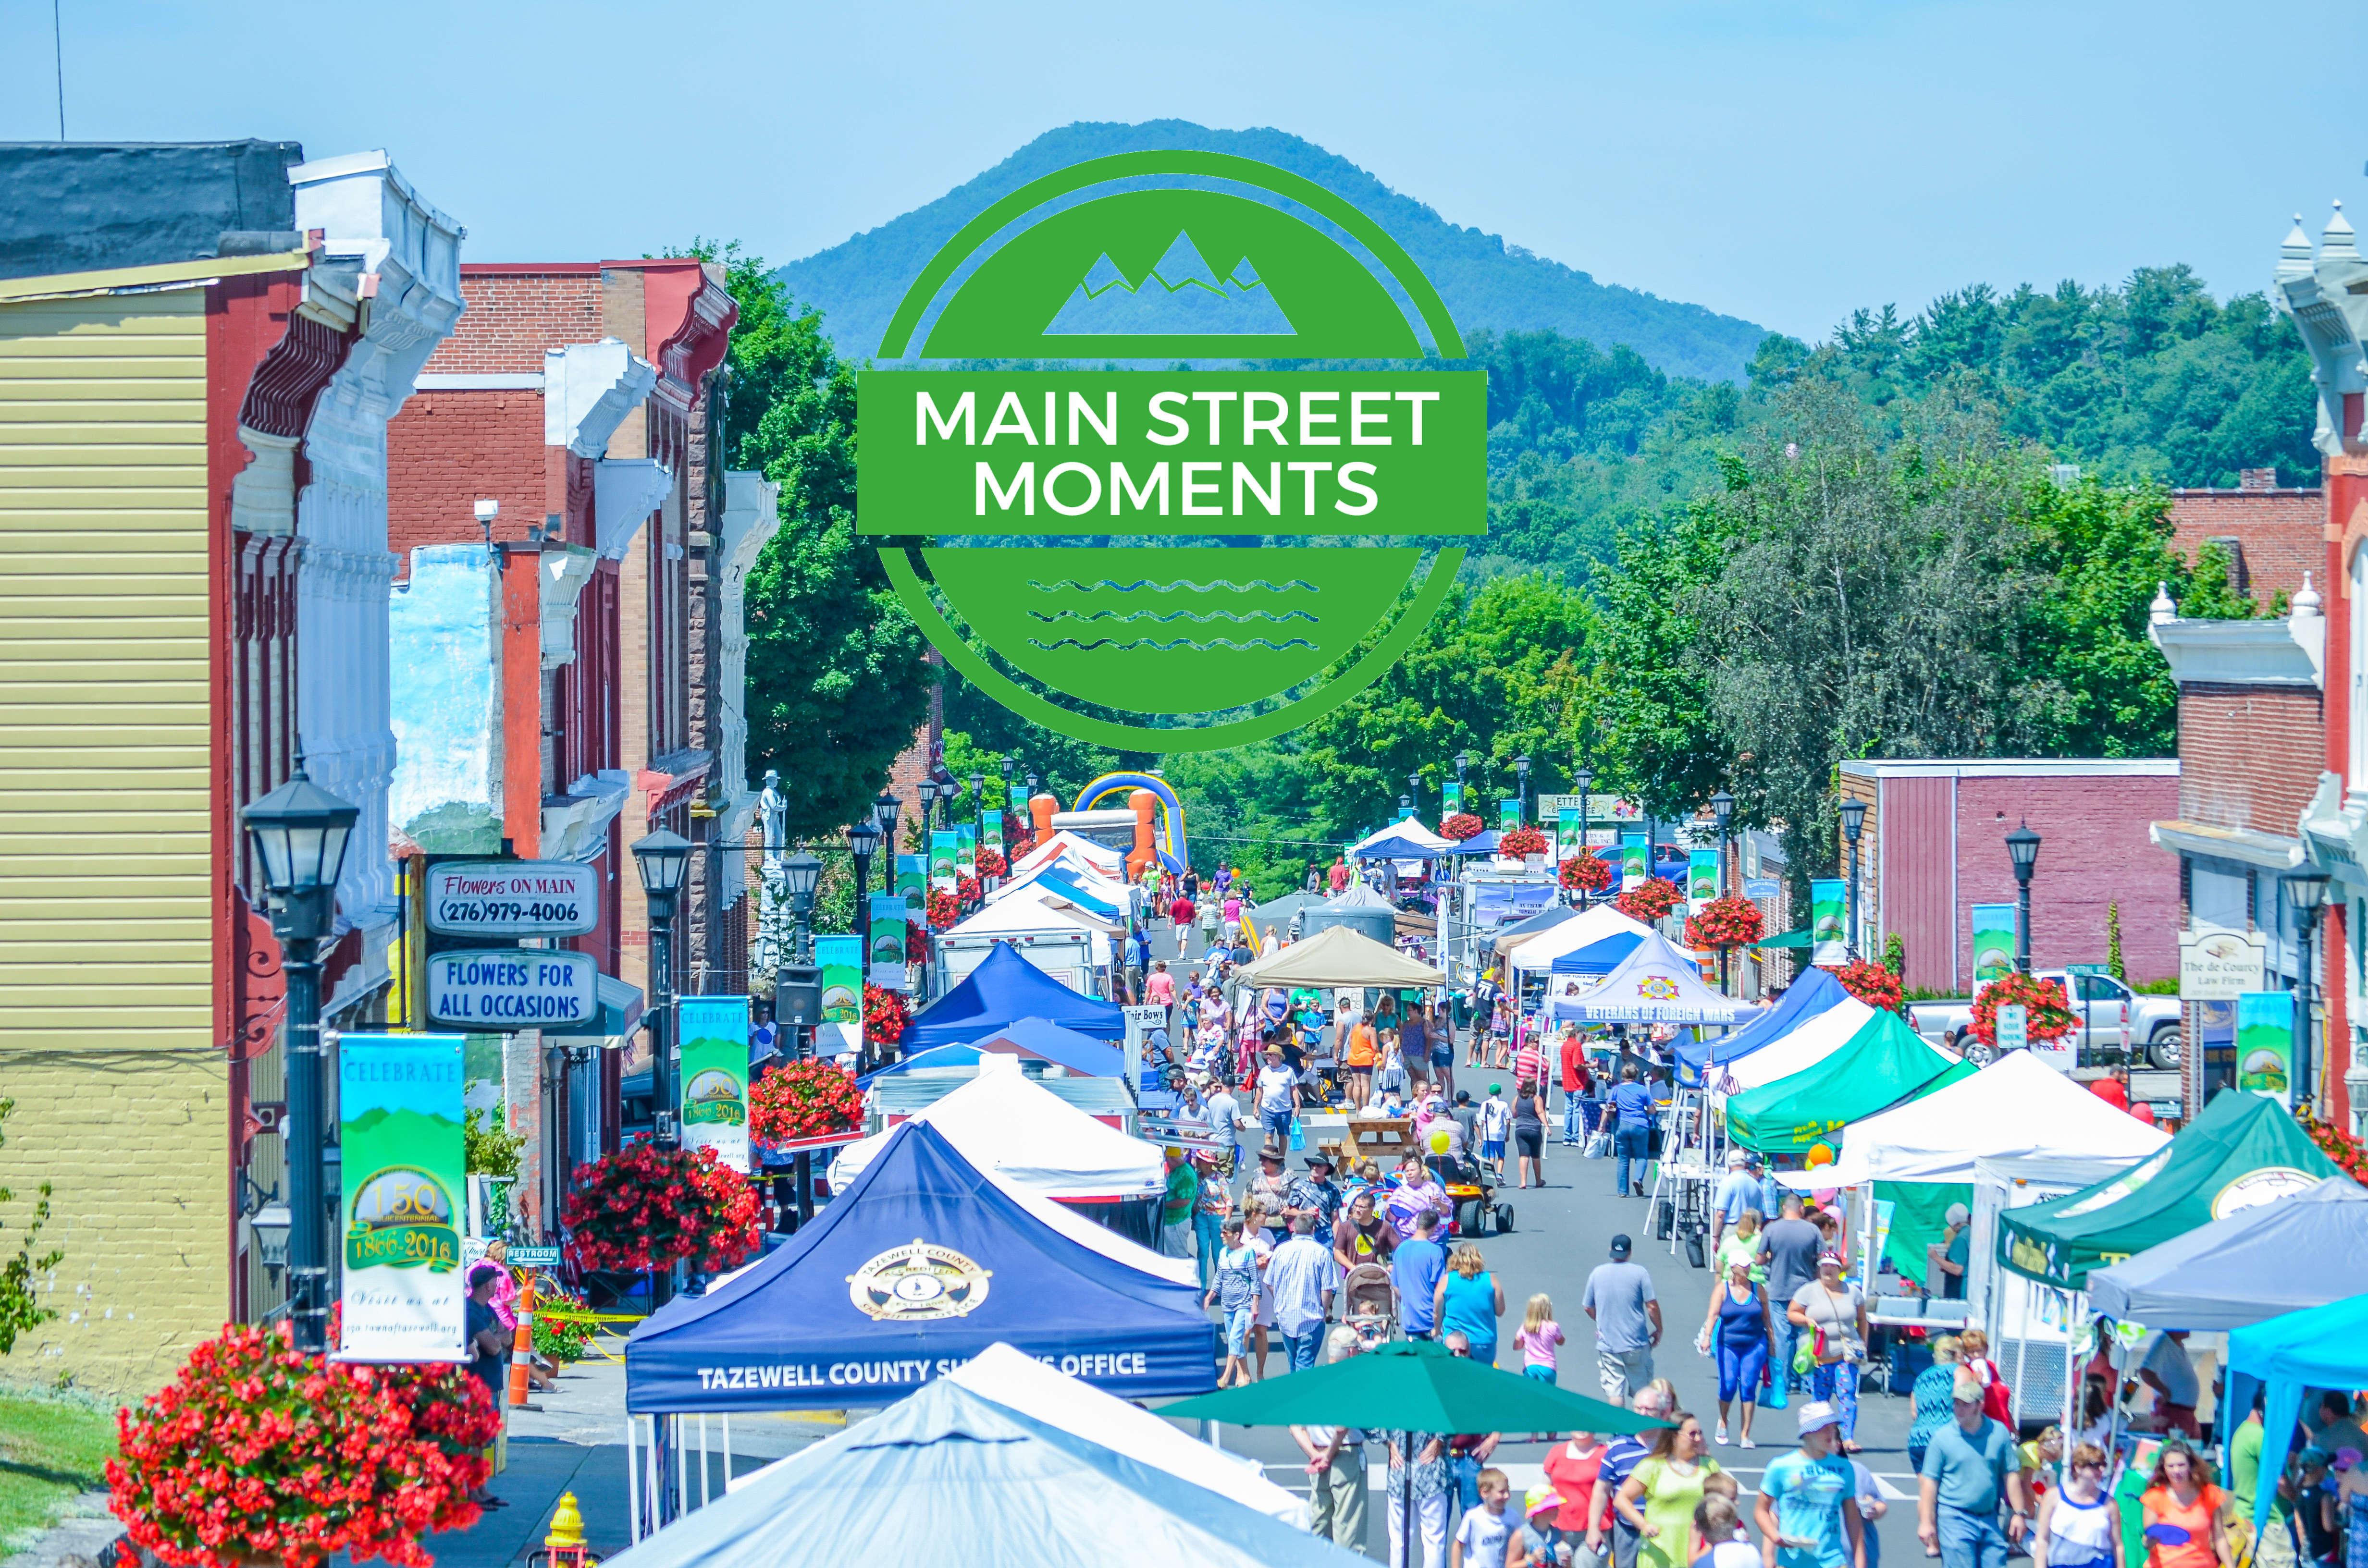 Main Street Moments